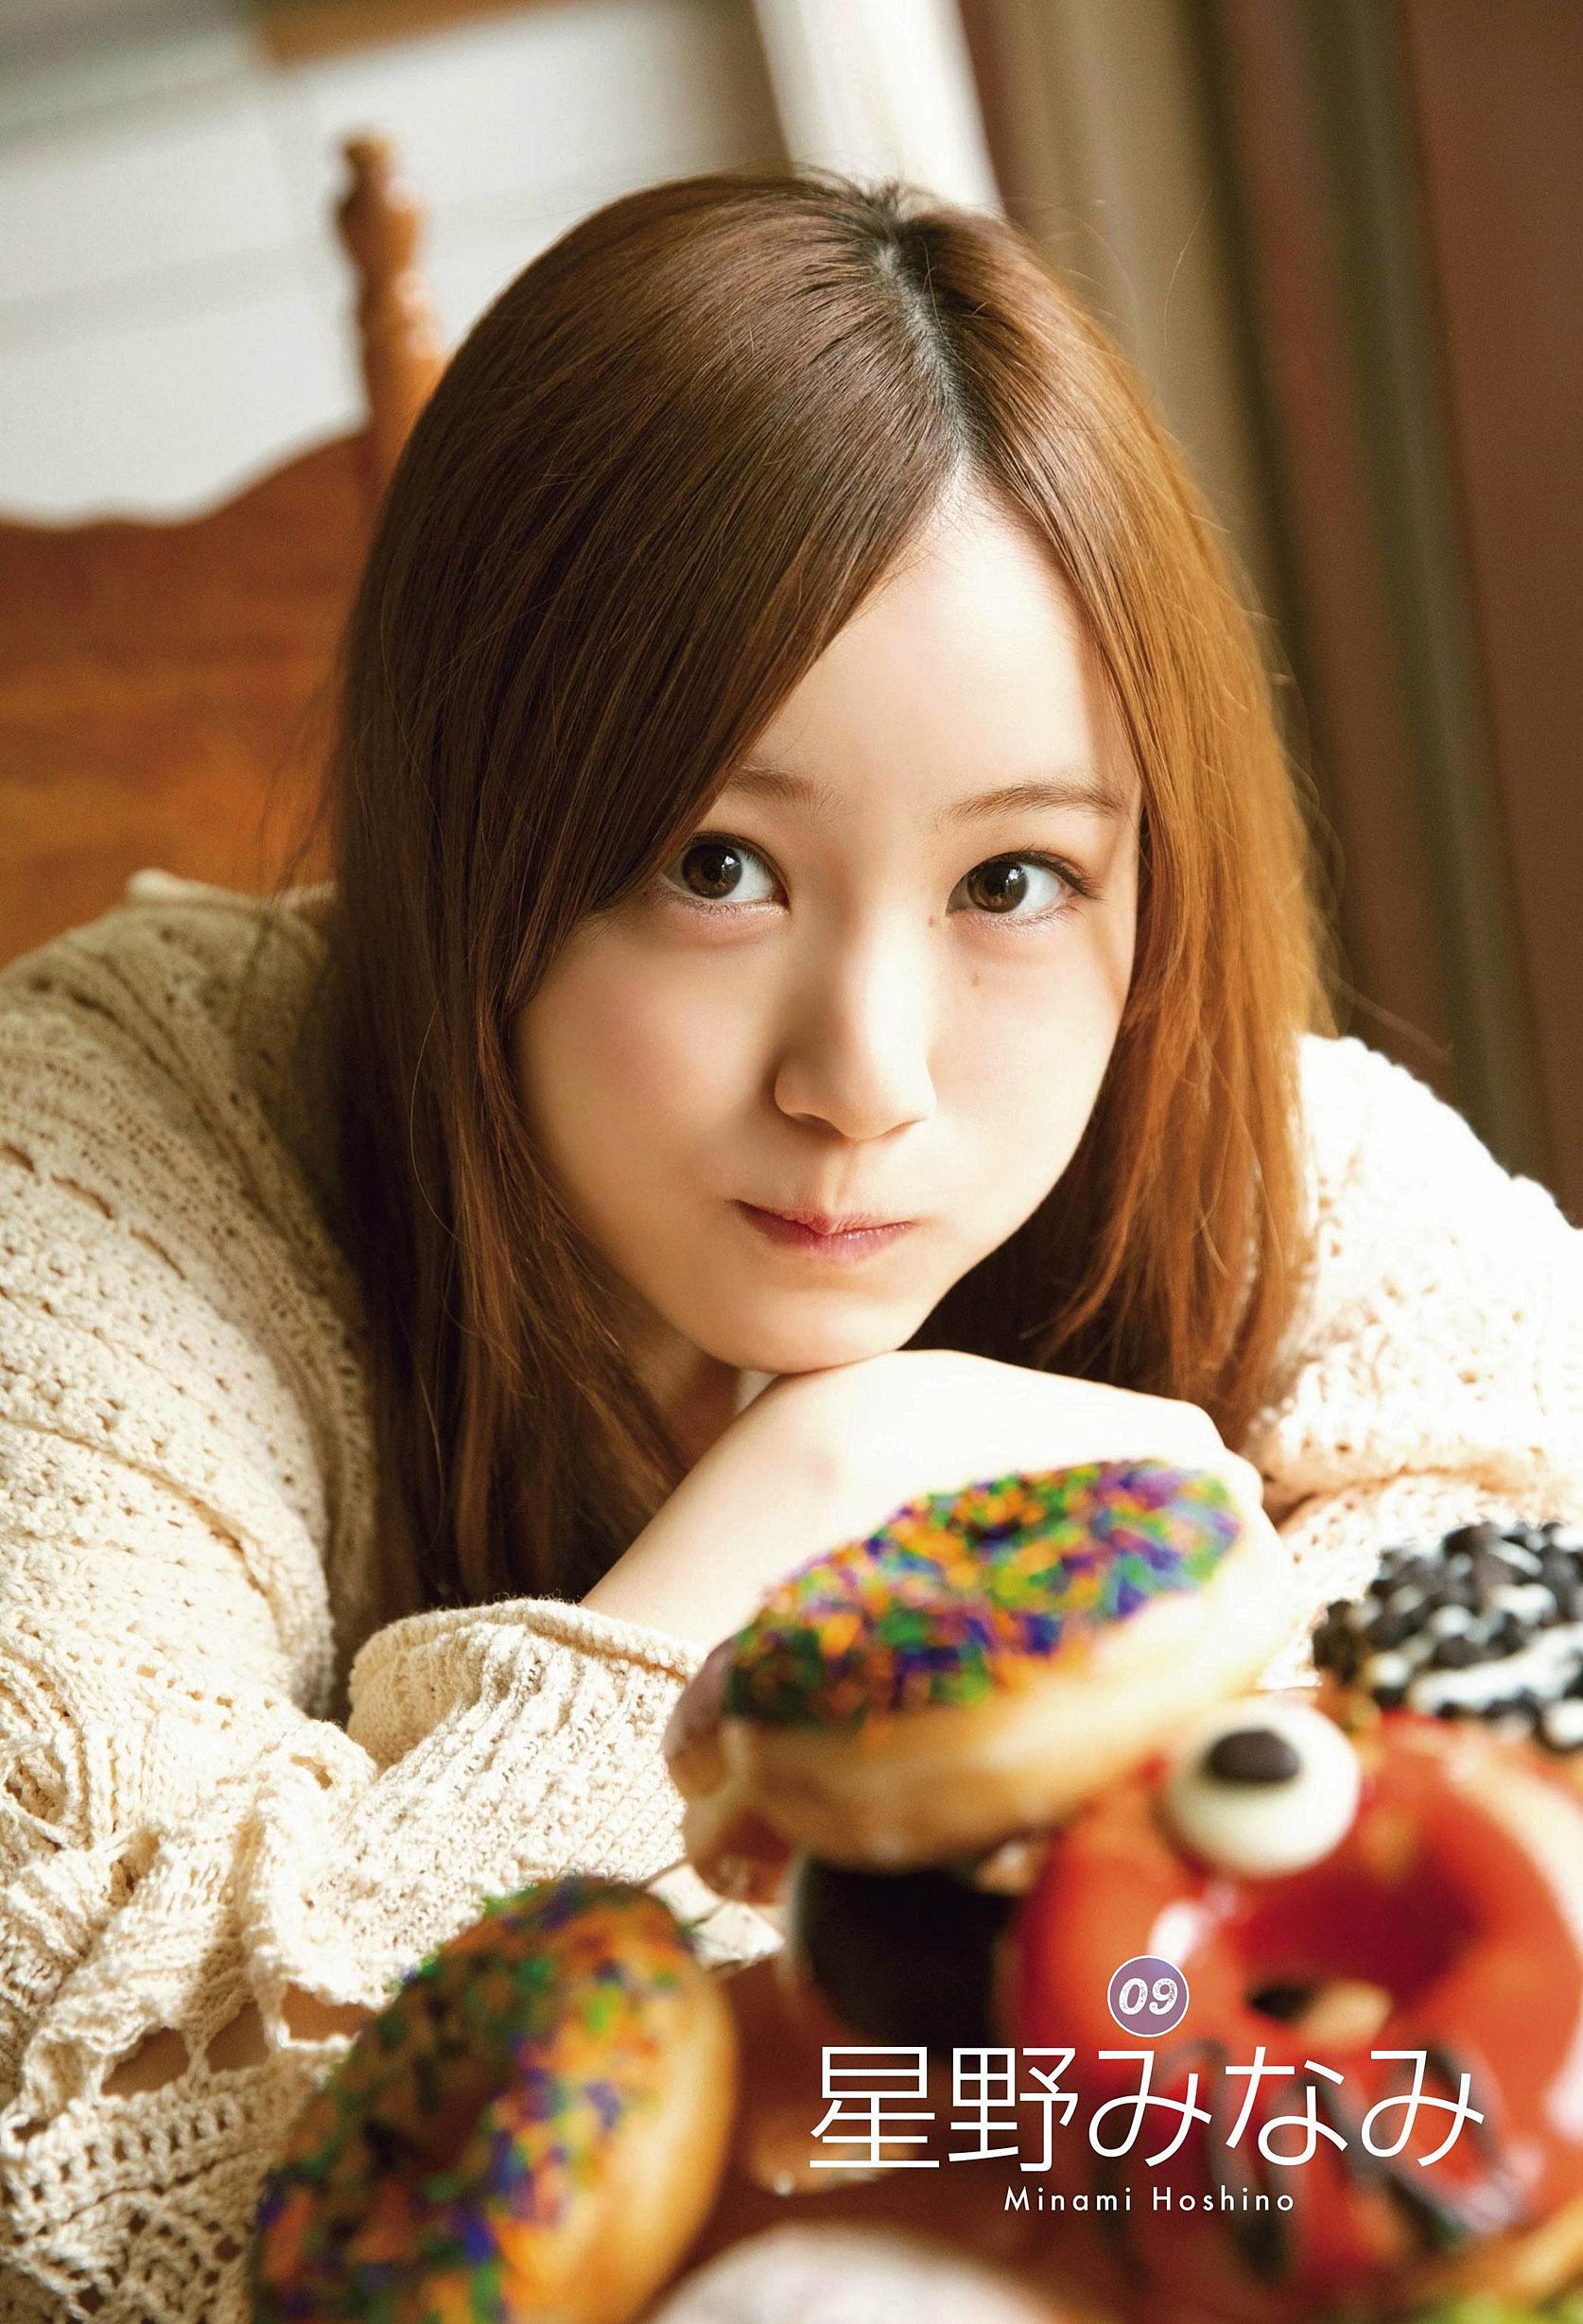 Minami Hoshino EnTame 2002 01.jpg